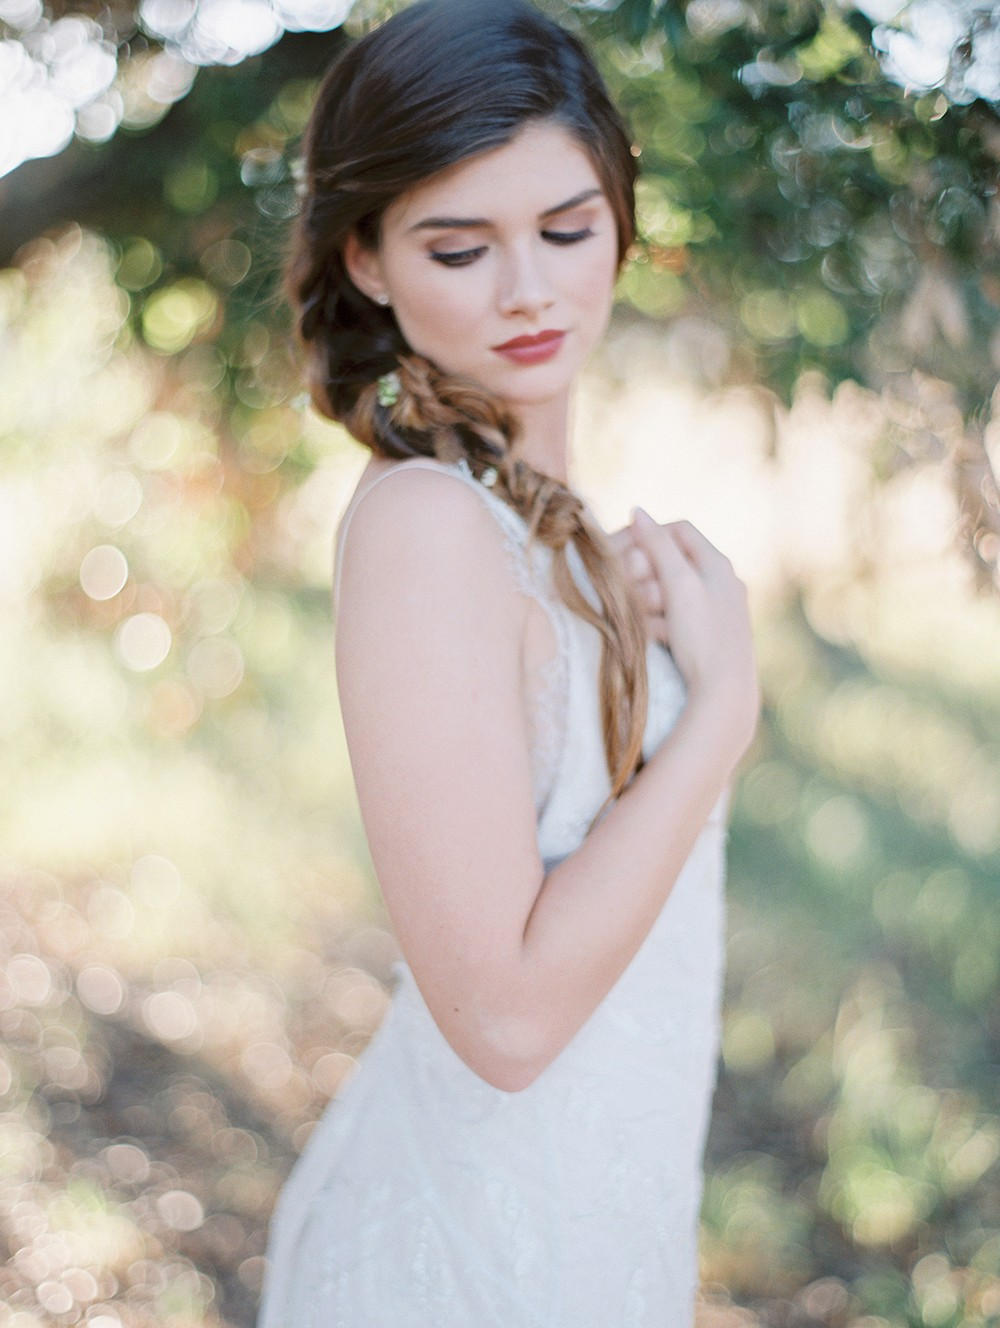 Braided Hair for a Spring Bride